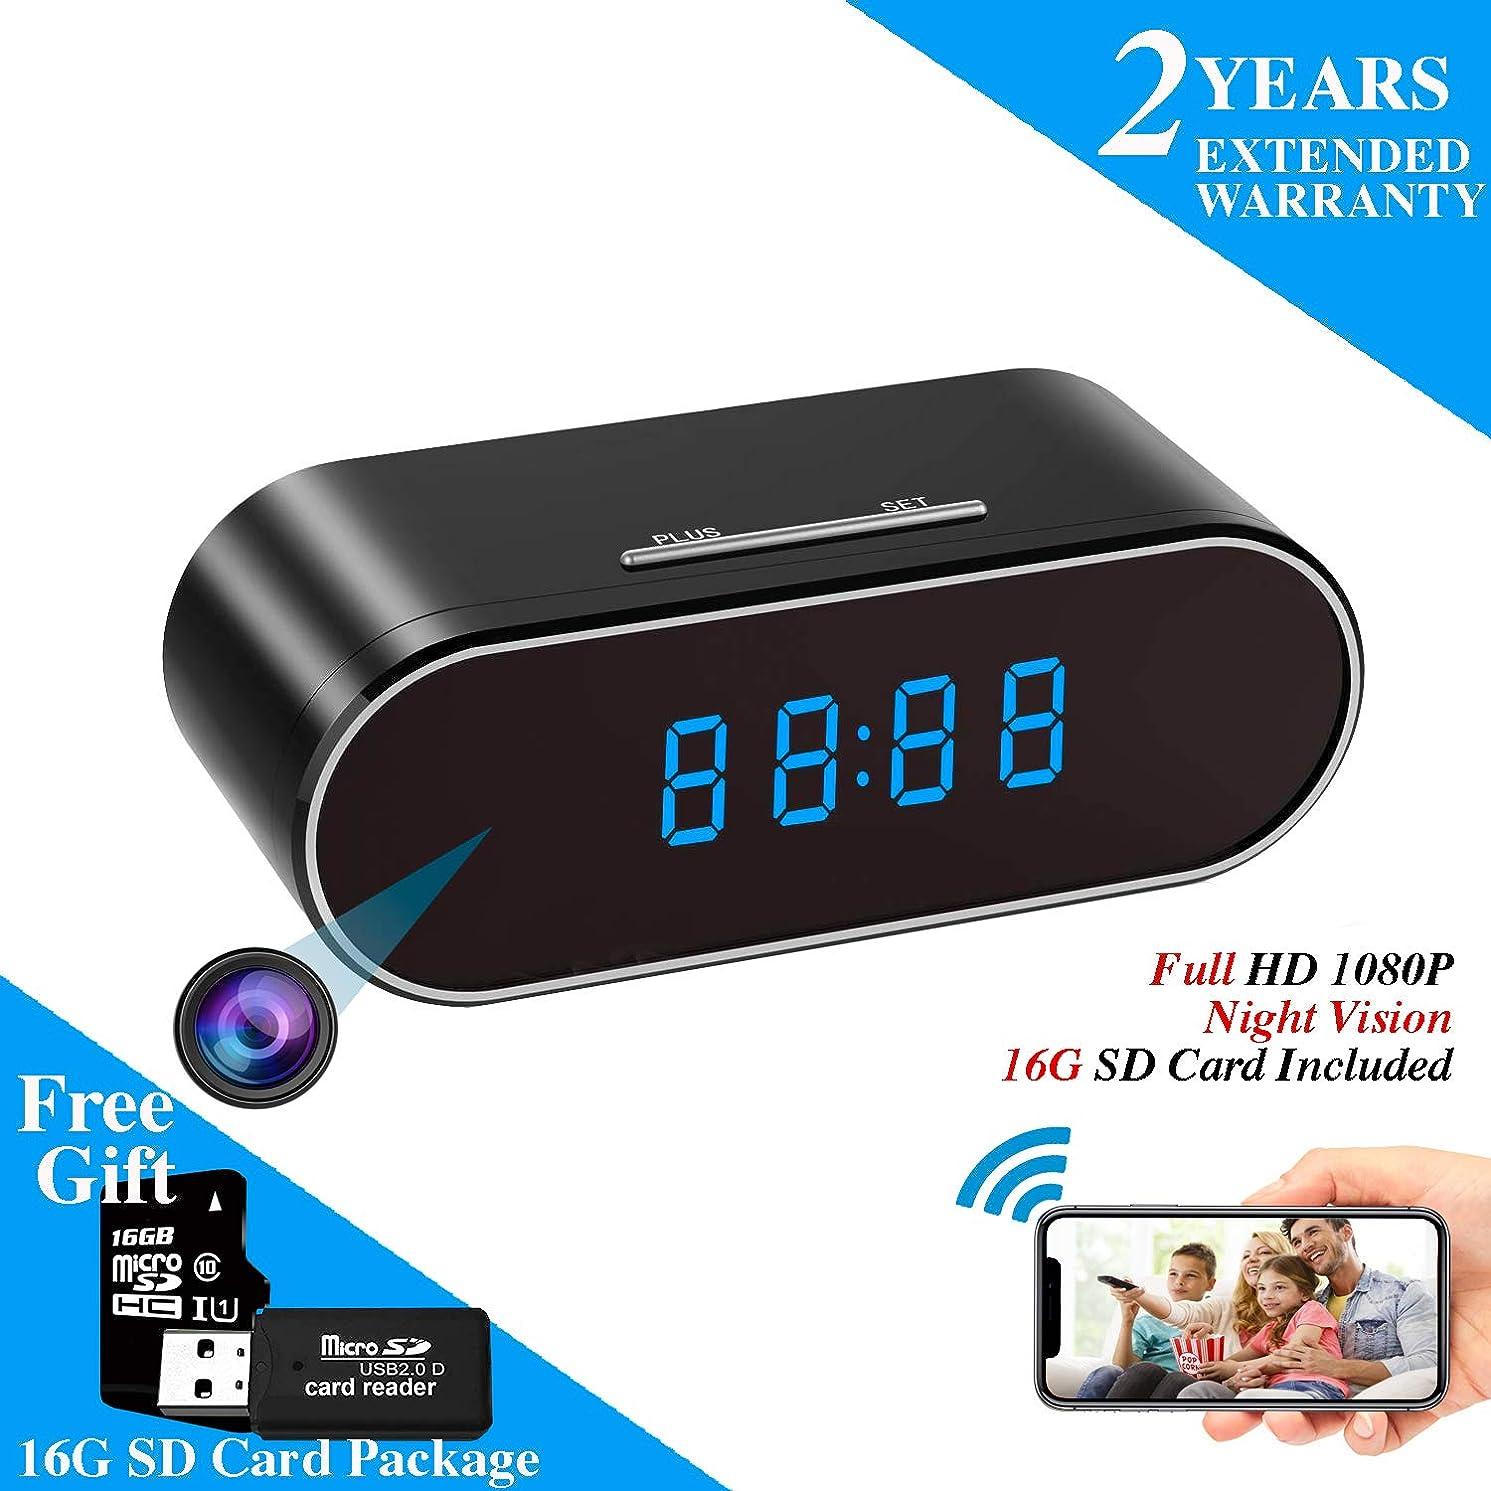 WEMLB HD 1080P WiFi Hidden Camera Alarm Clock Night Vision/Motion Detection/Loop Recording Wireless Security Camera for Home Surveillance - Spy Cameras